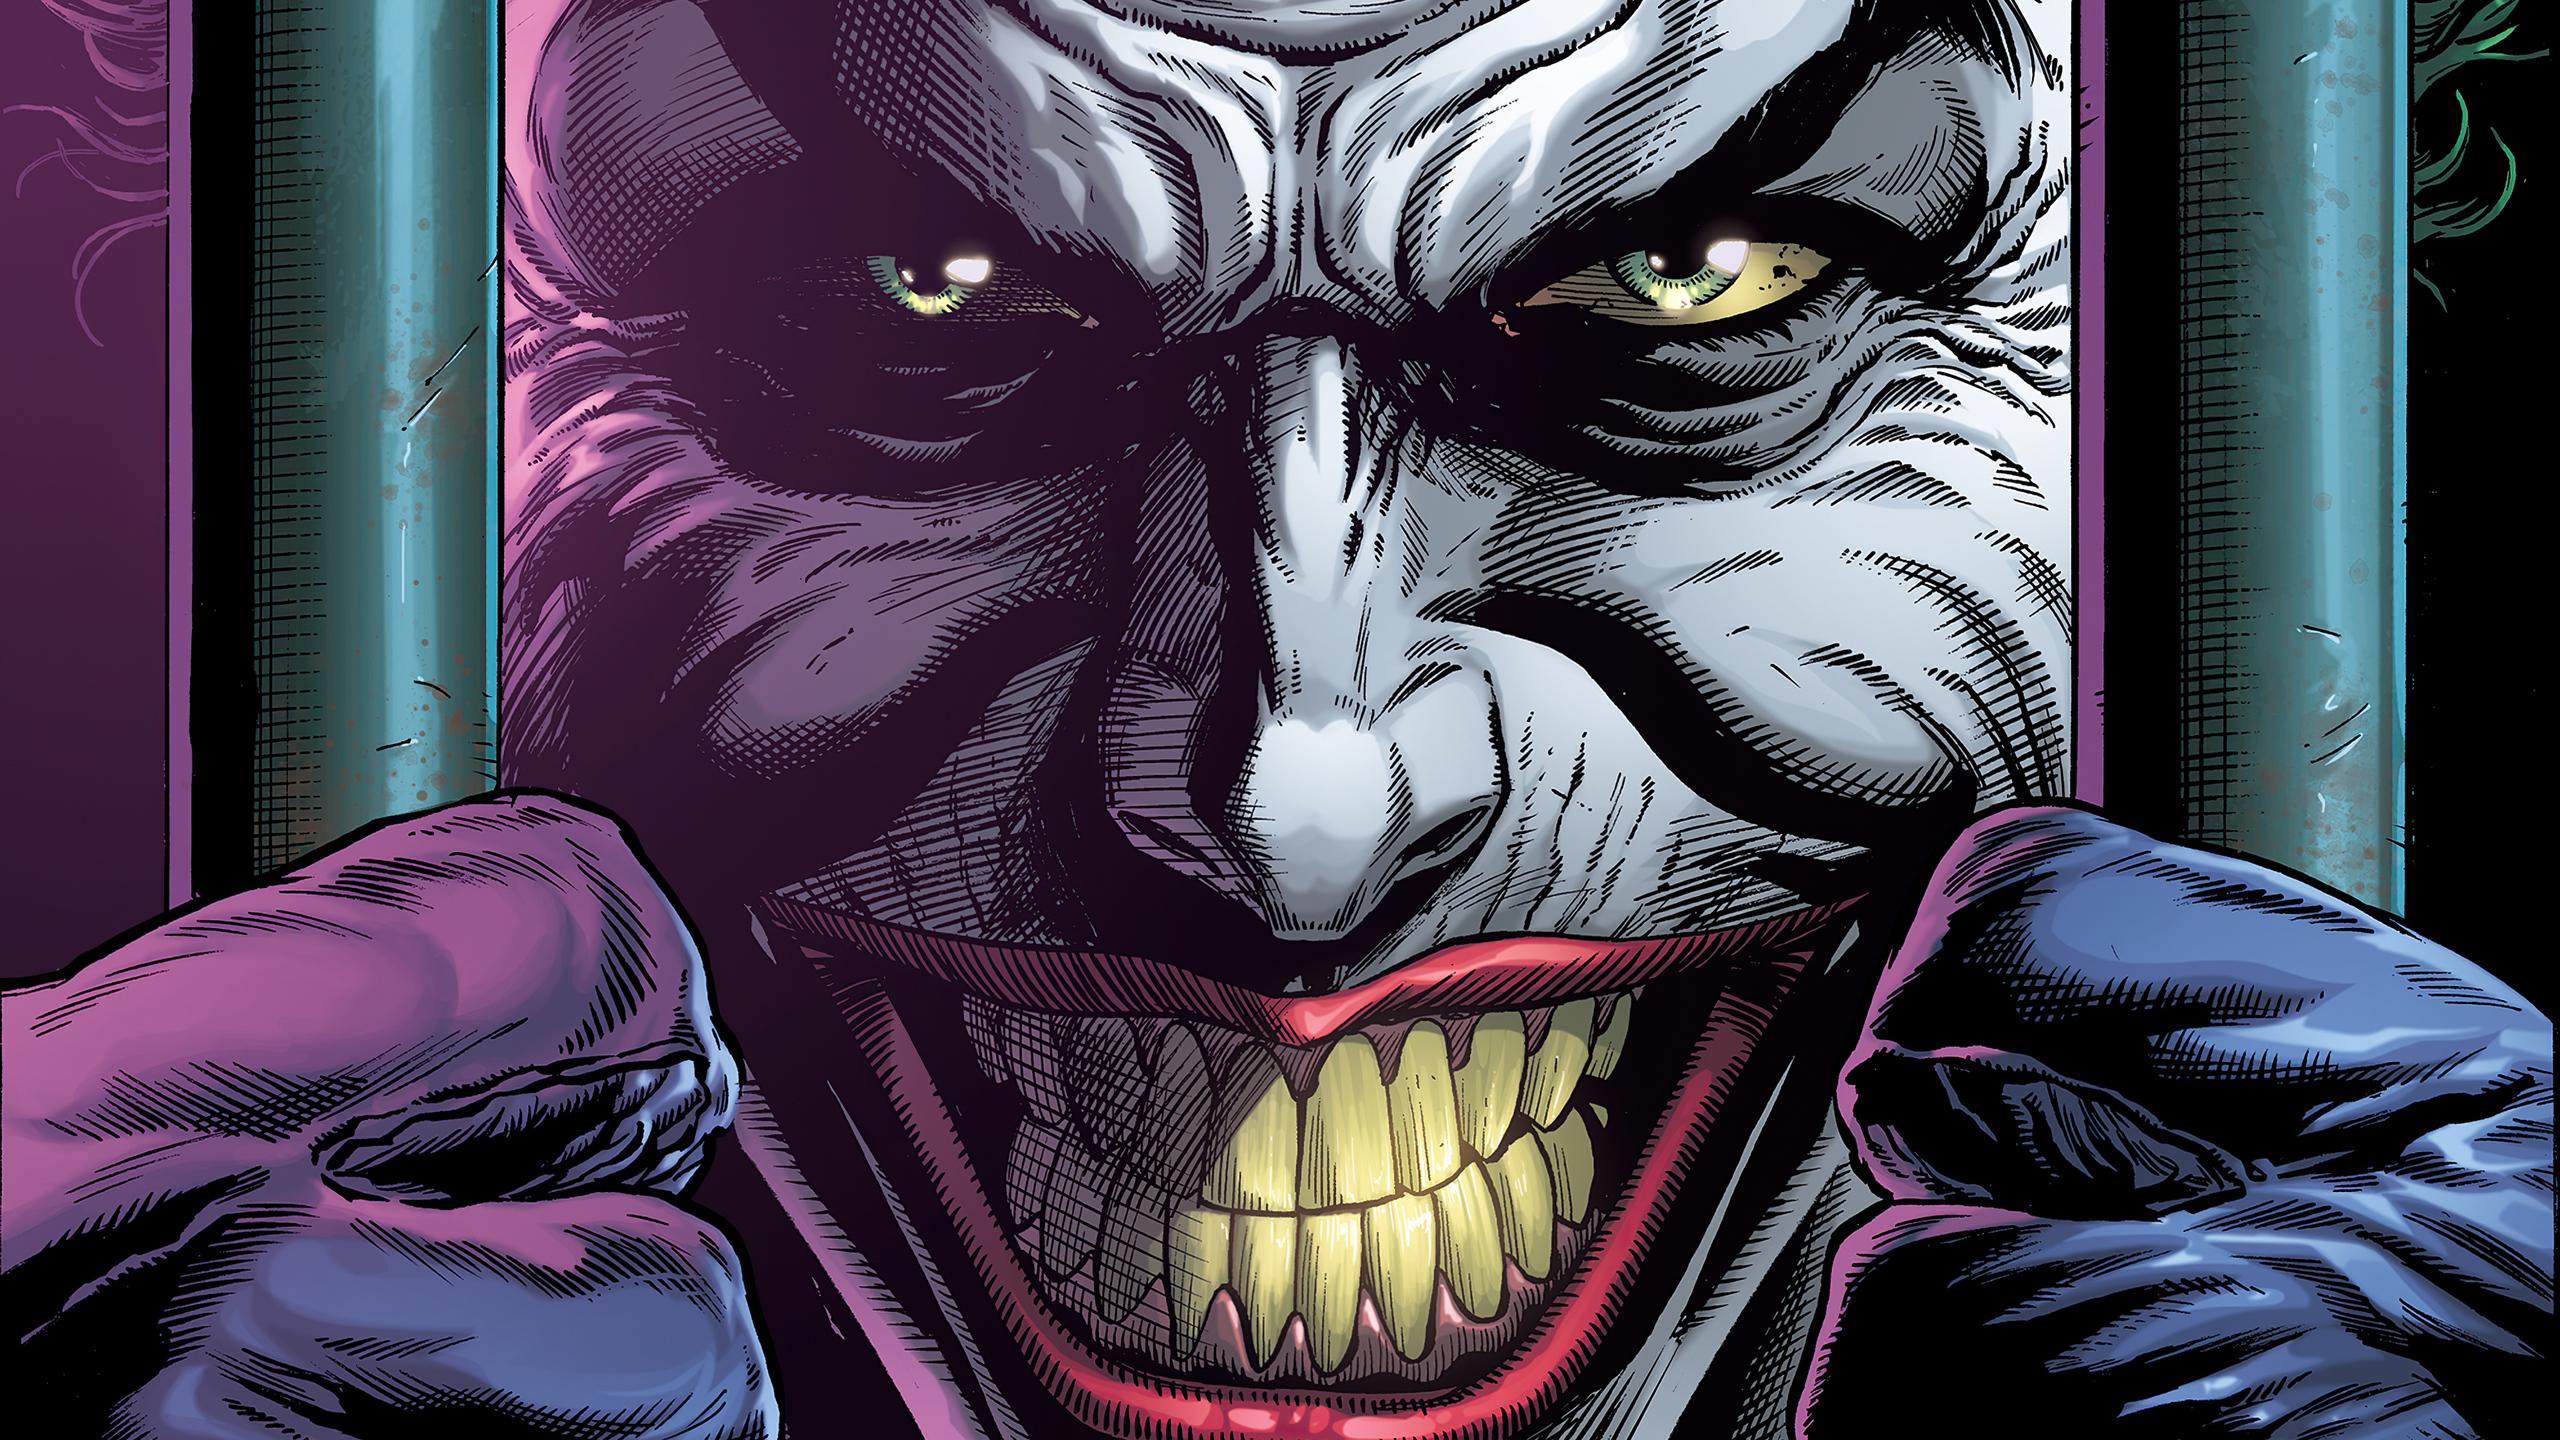 2560x1440 4k Joker Smile 1440P Resolution HD 4k Wallpapers ...